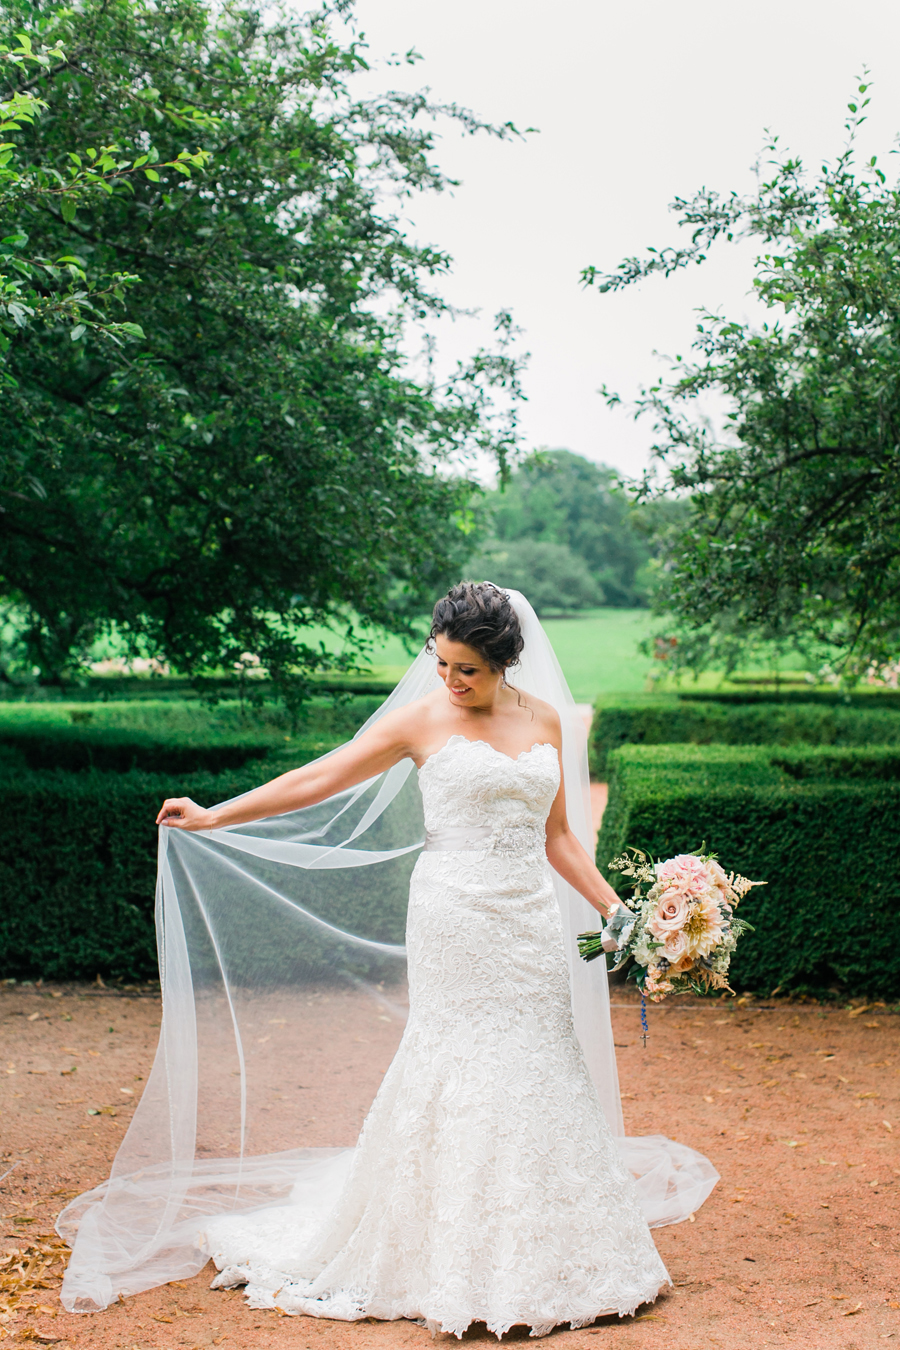 artistrie-co-best-wedding-photos-2015-021